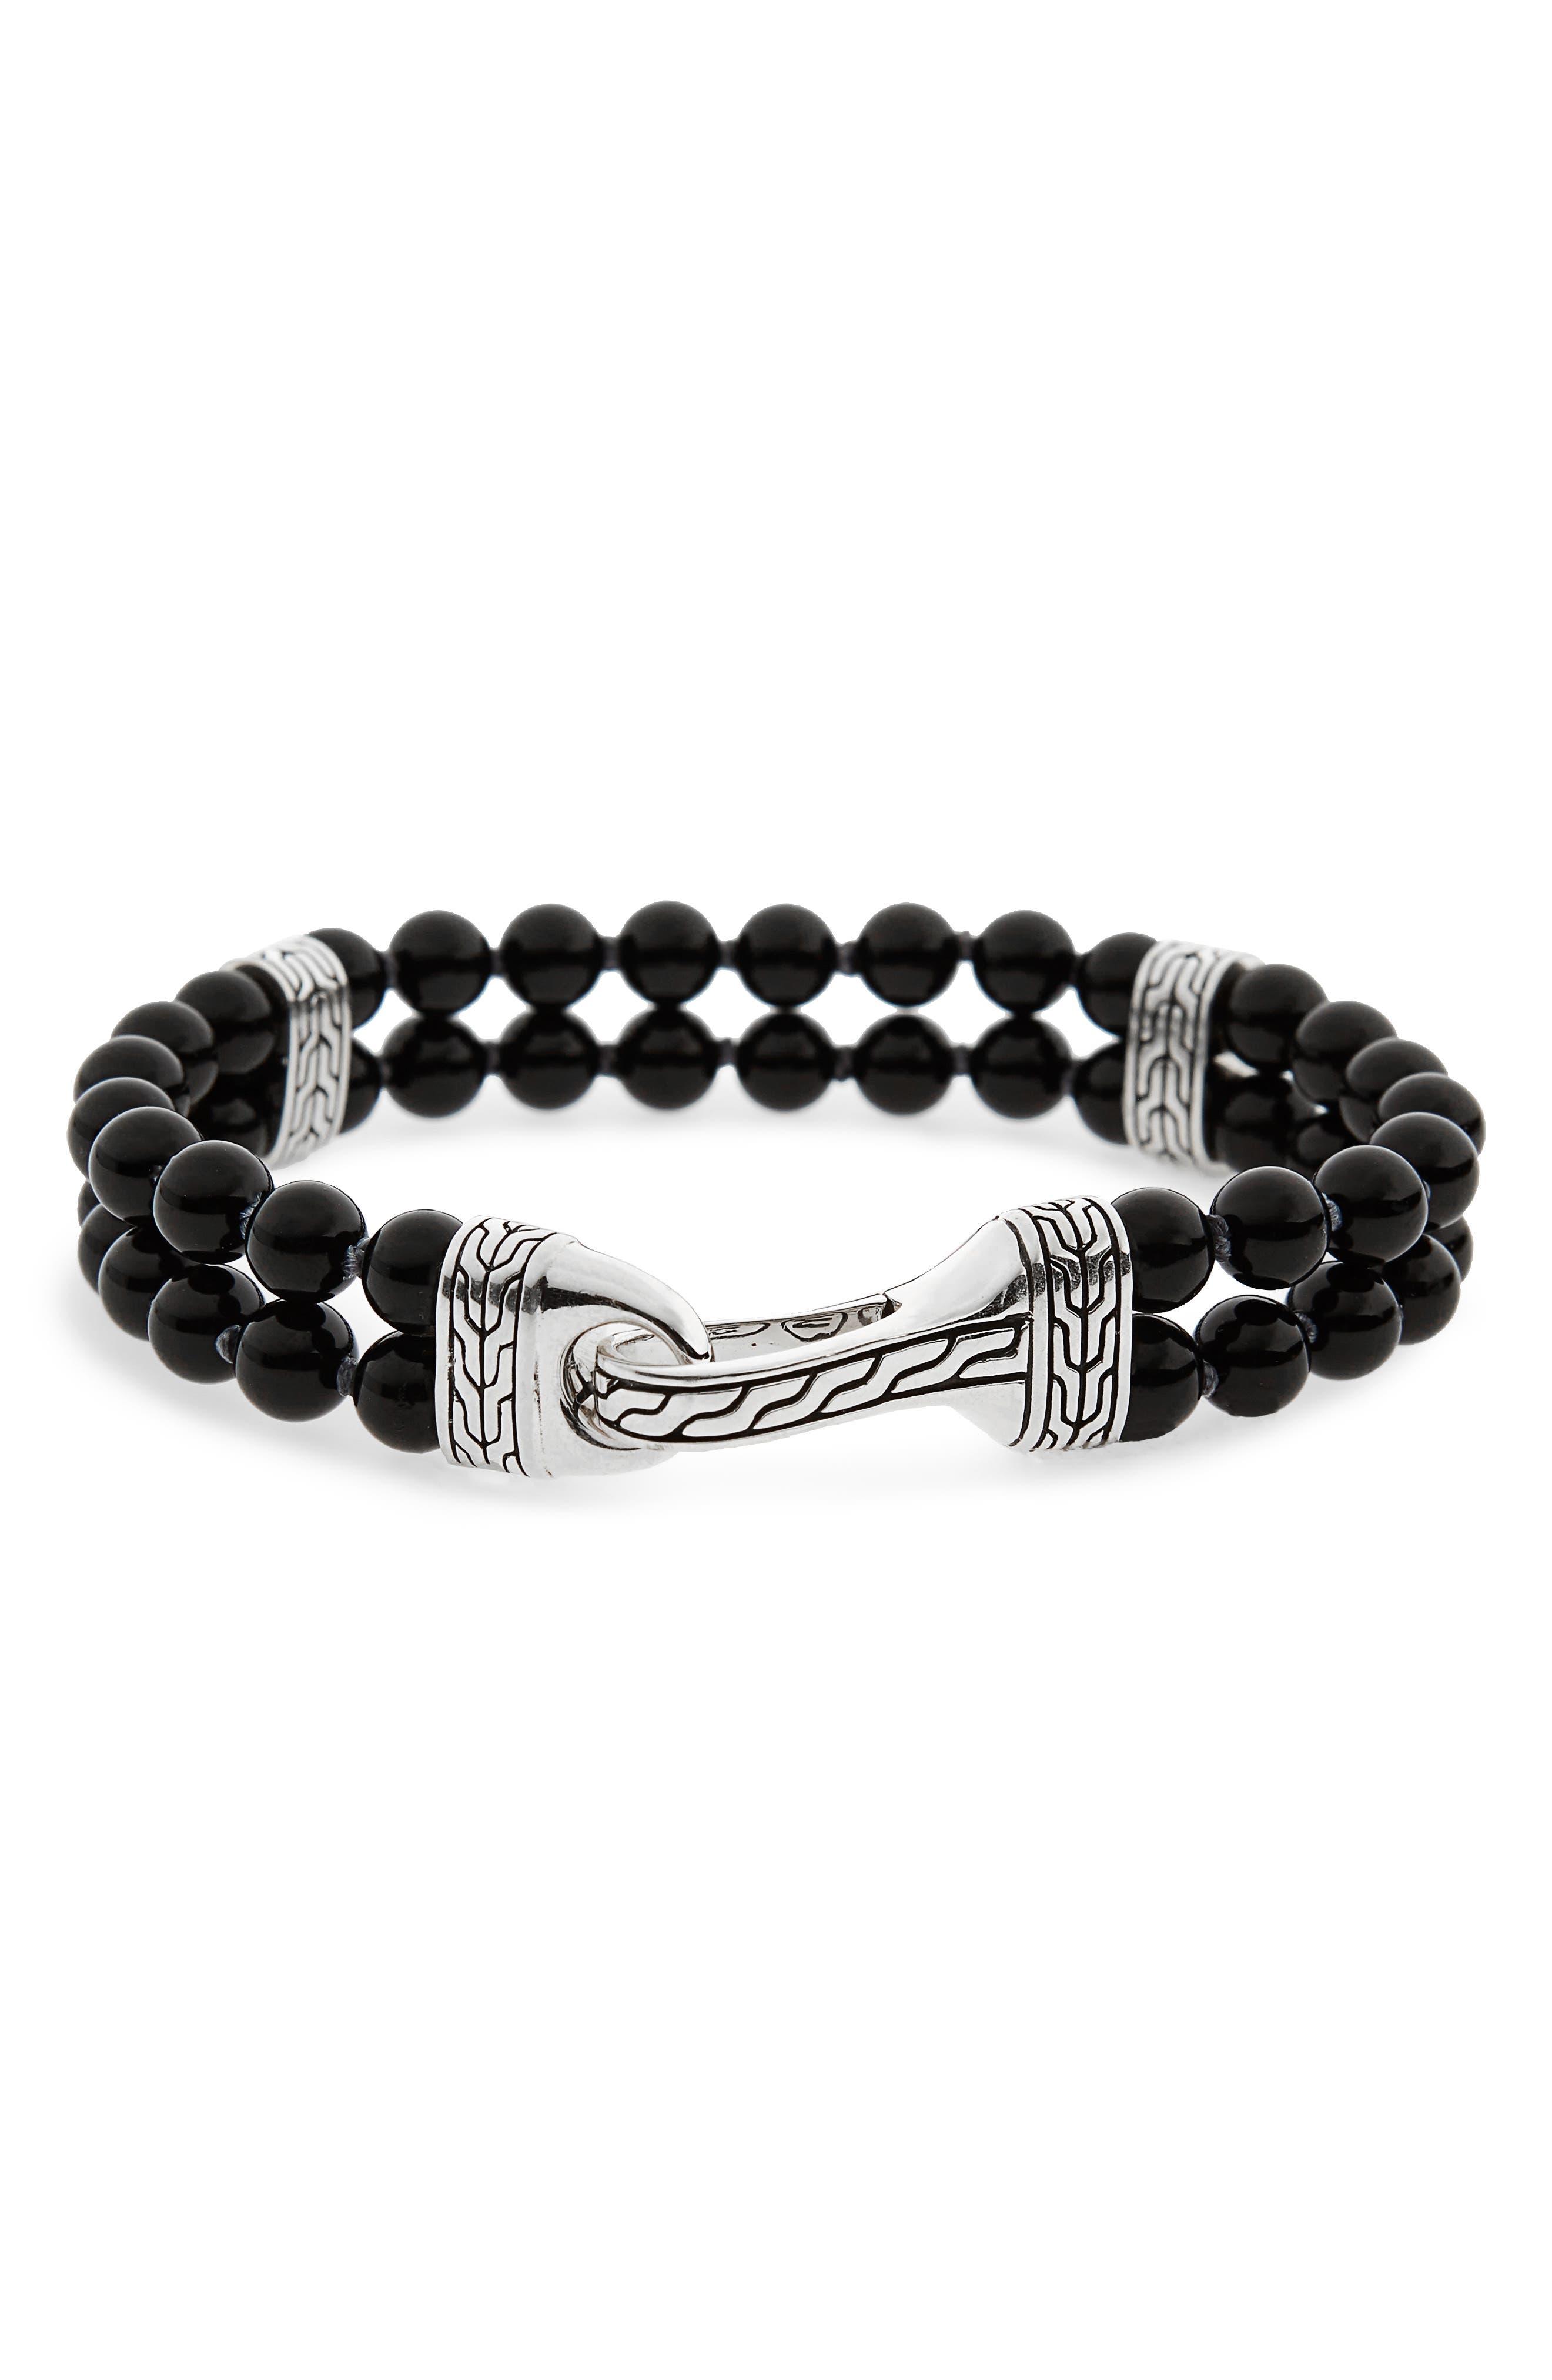 Classic Chain Double Row Black Onyx Bead Bracelet,                             Main thumbnail 1, color,                             BLACK ONYX/ SILVER